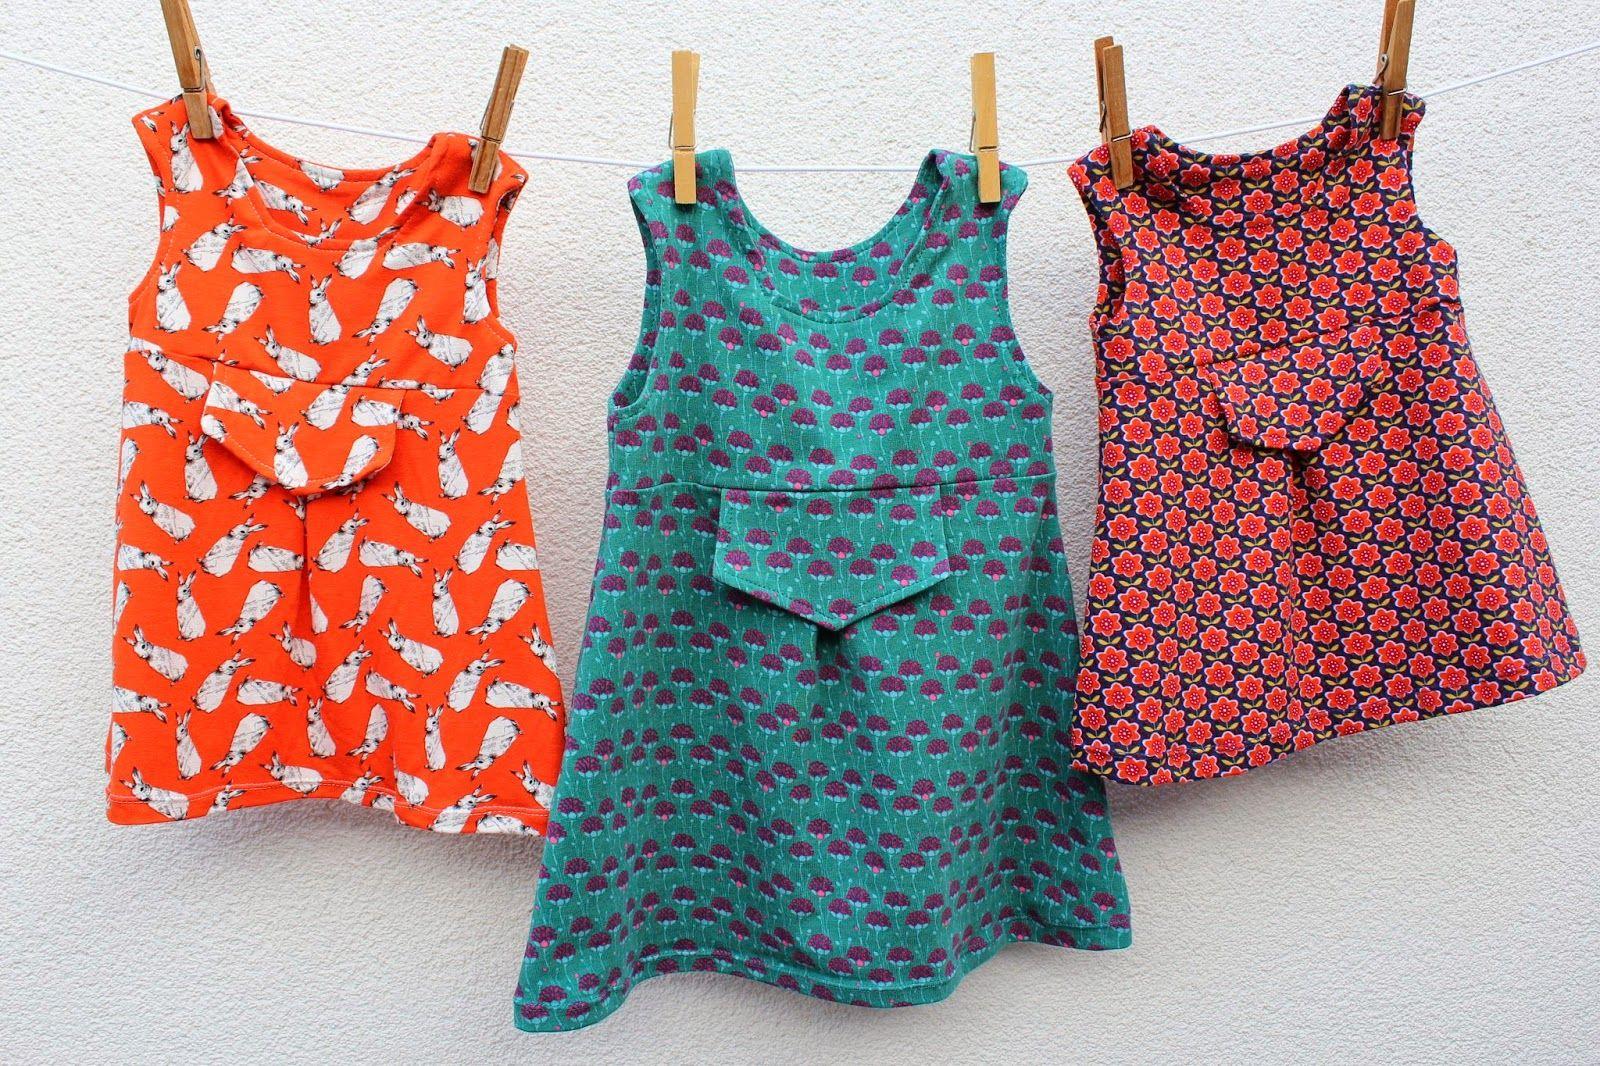 a7d017e9e06e40 Lily en Woody: Tricot babykleedje: fotohandleiding in 10 stappen ...